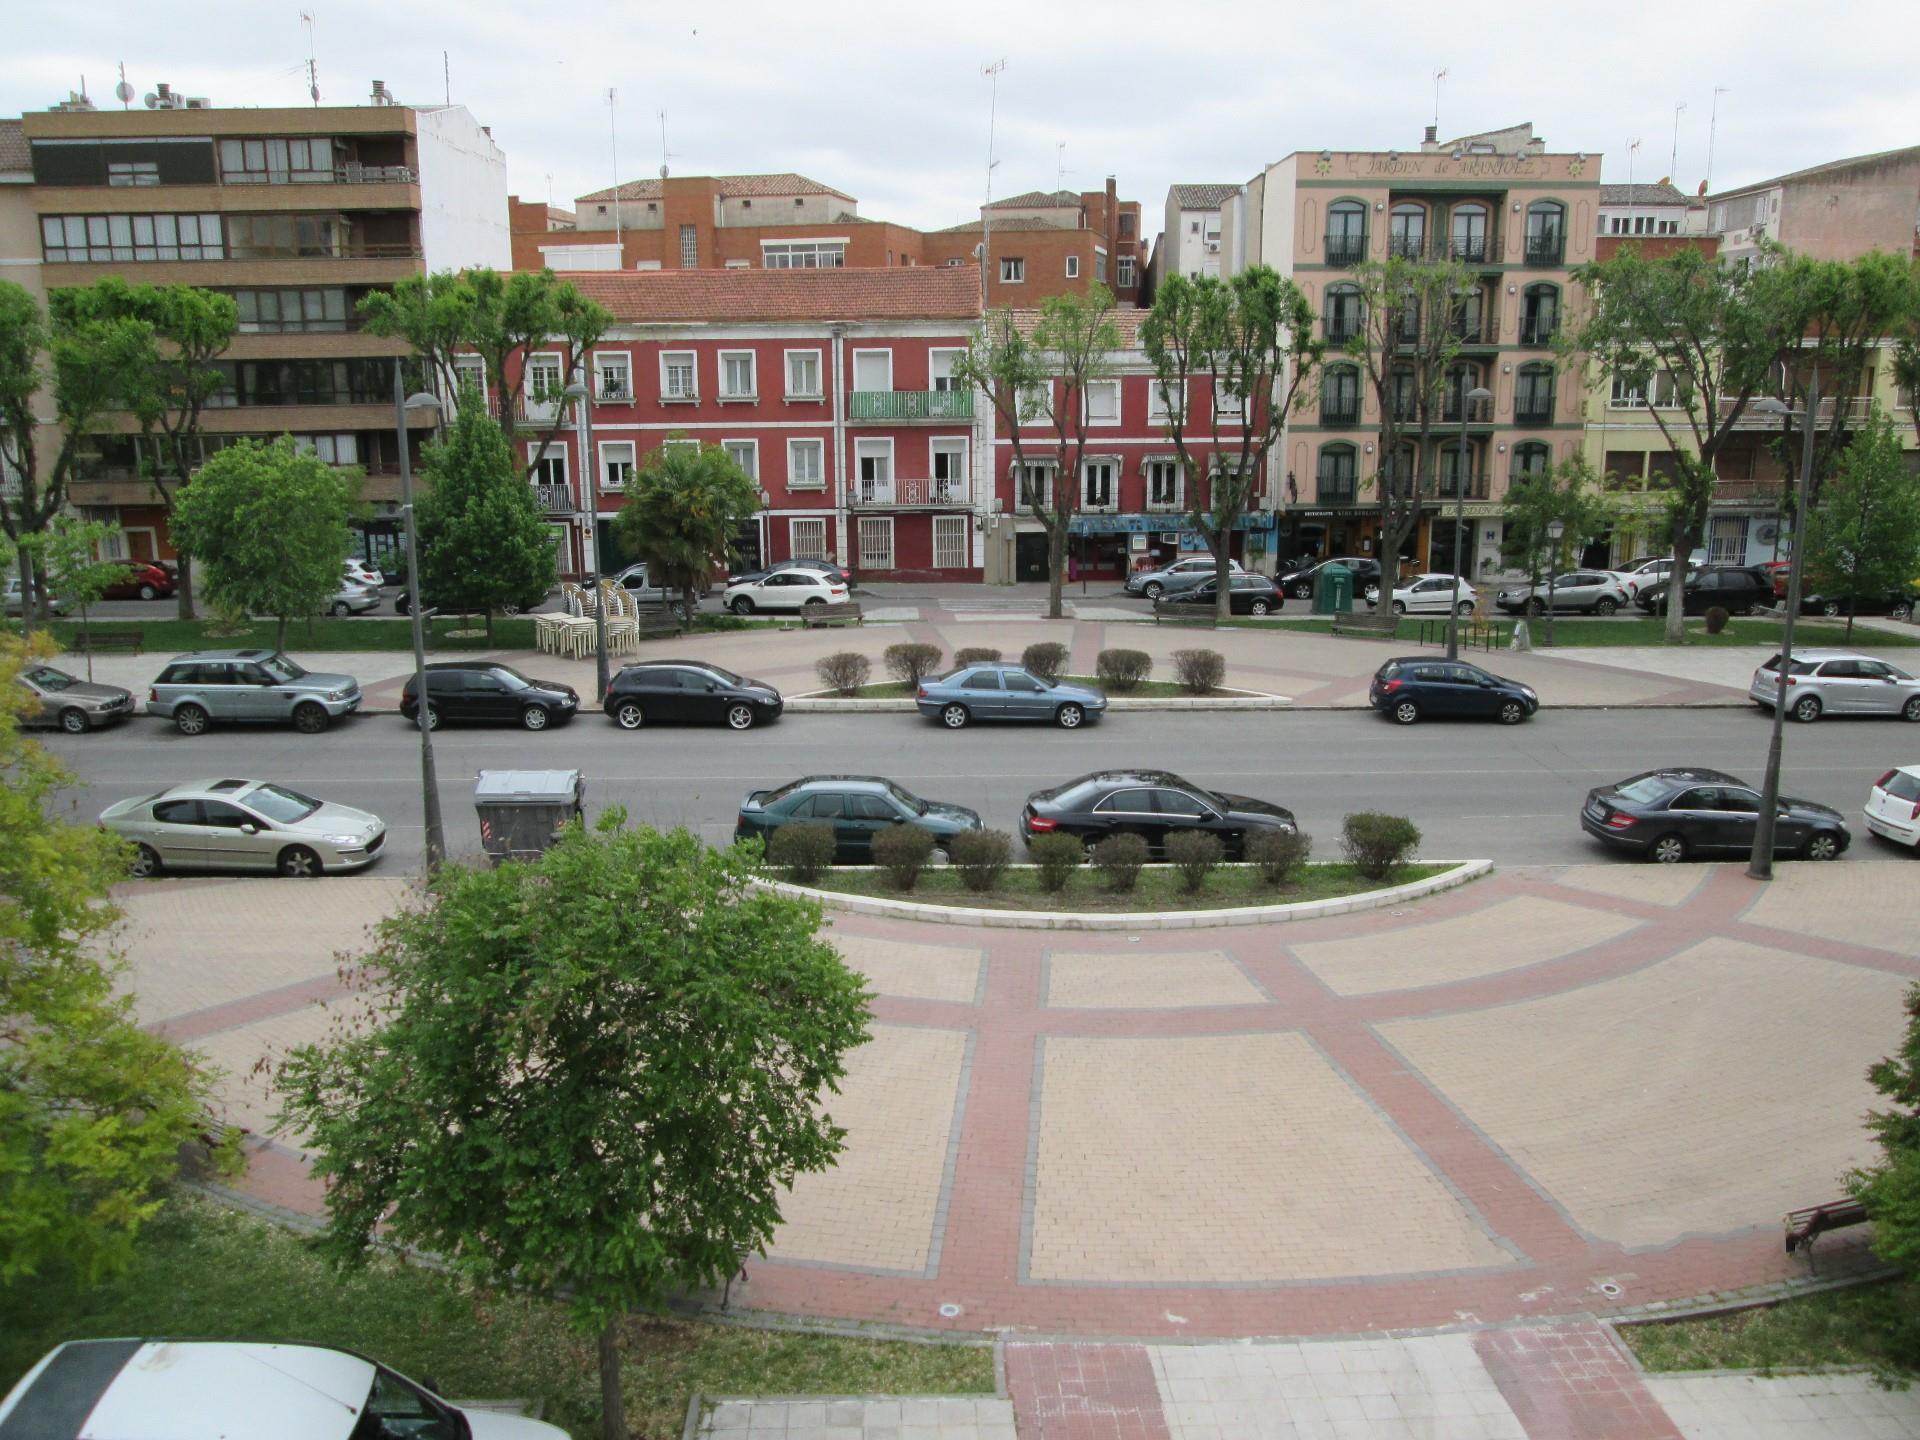 Dúplex  Calle del príncipe. Centro